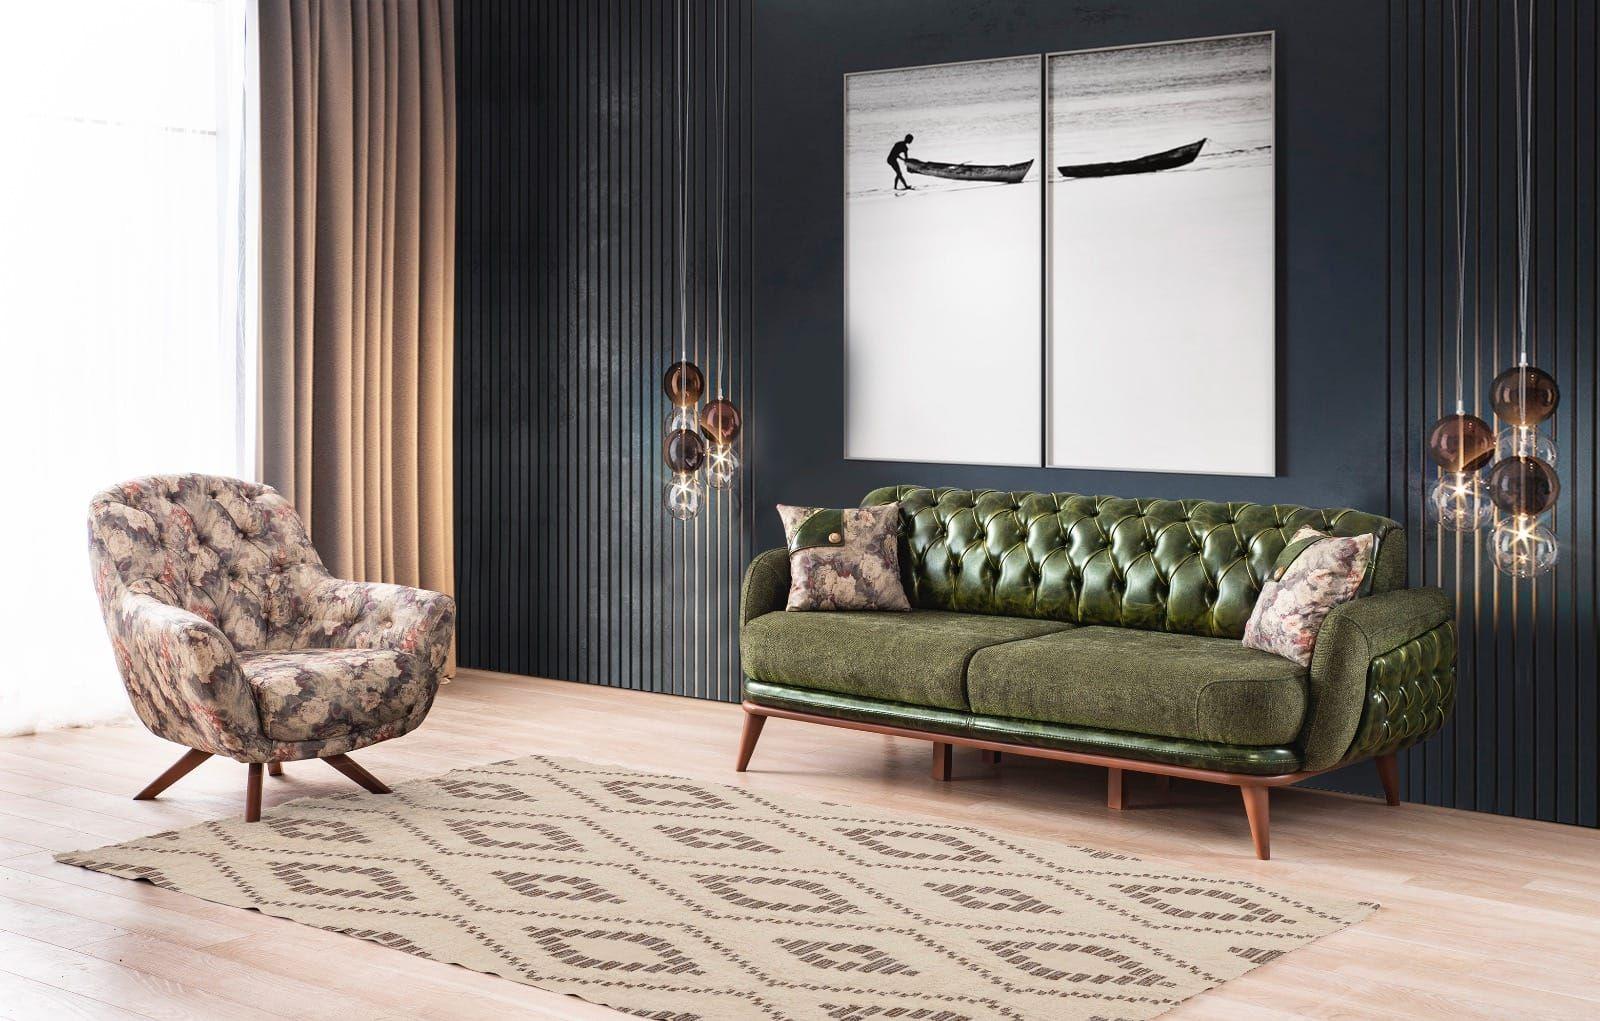 Koltuk Takimlari 2020 Mobilya Fikirleri Furniture Ev Dekoru